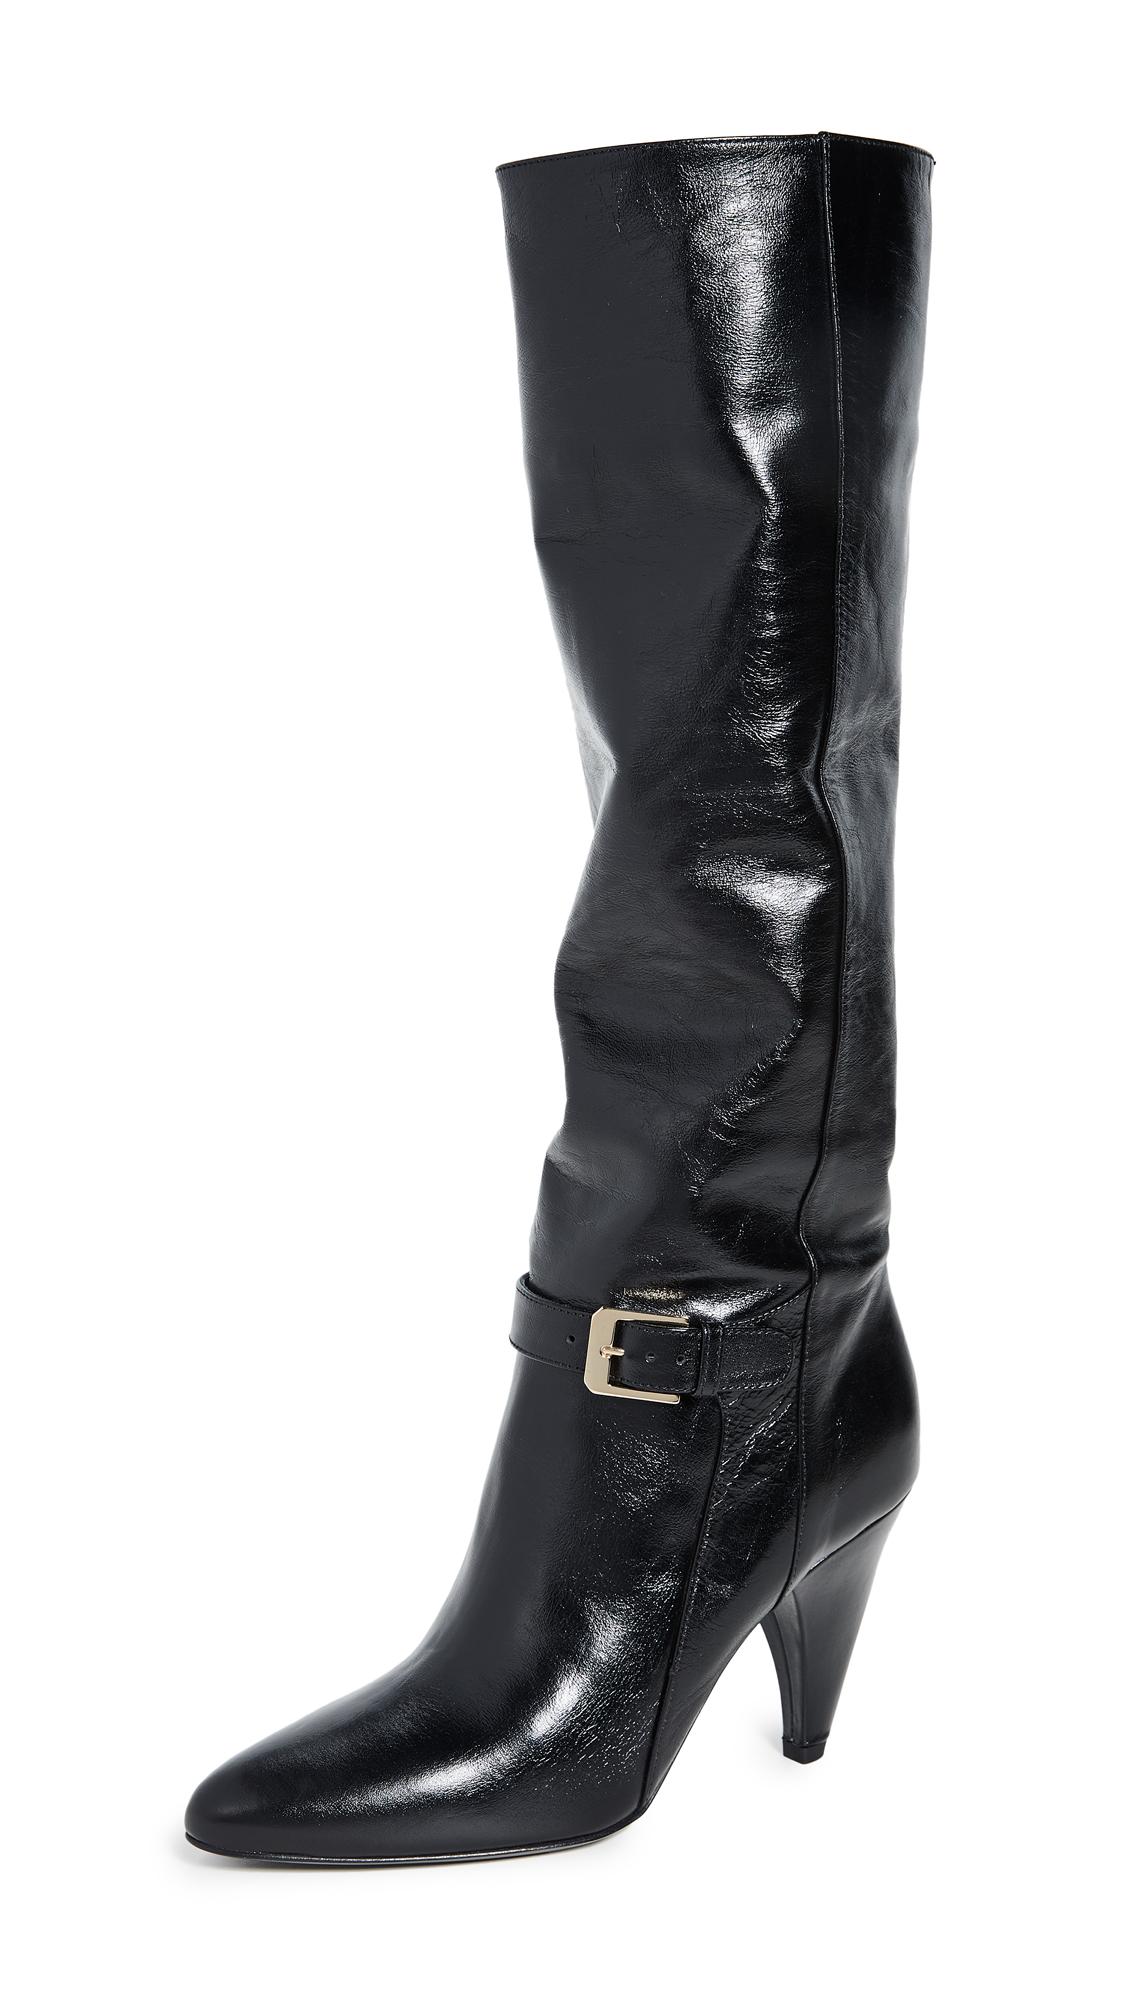 Laurence Dacade Vlad Boots - 70% Off Sale